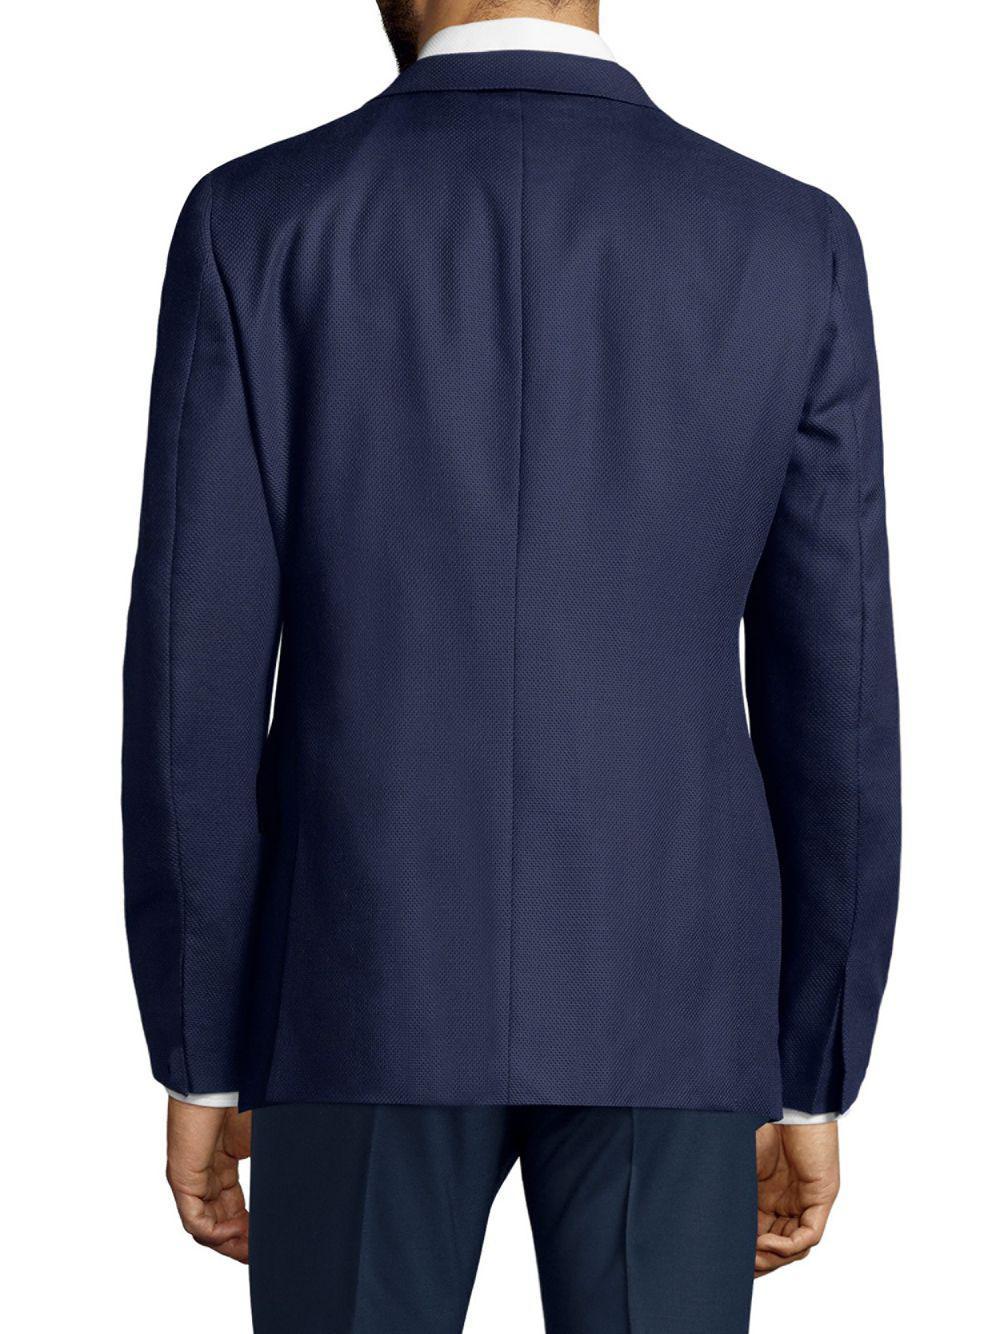 Boglioli Wool Textured Suit Jacket in Navy (Blue) for Men